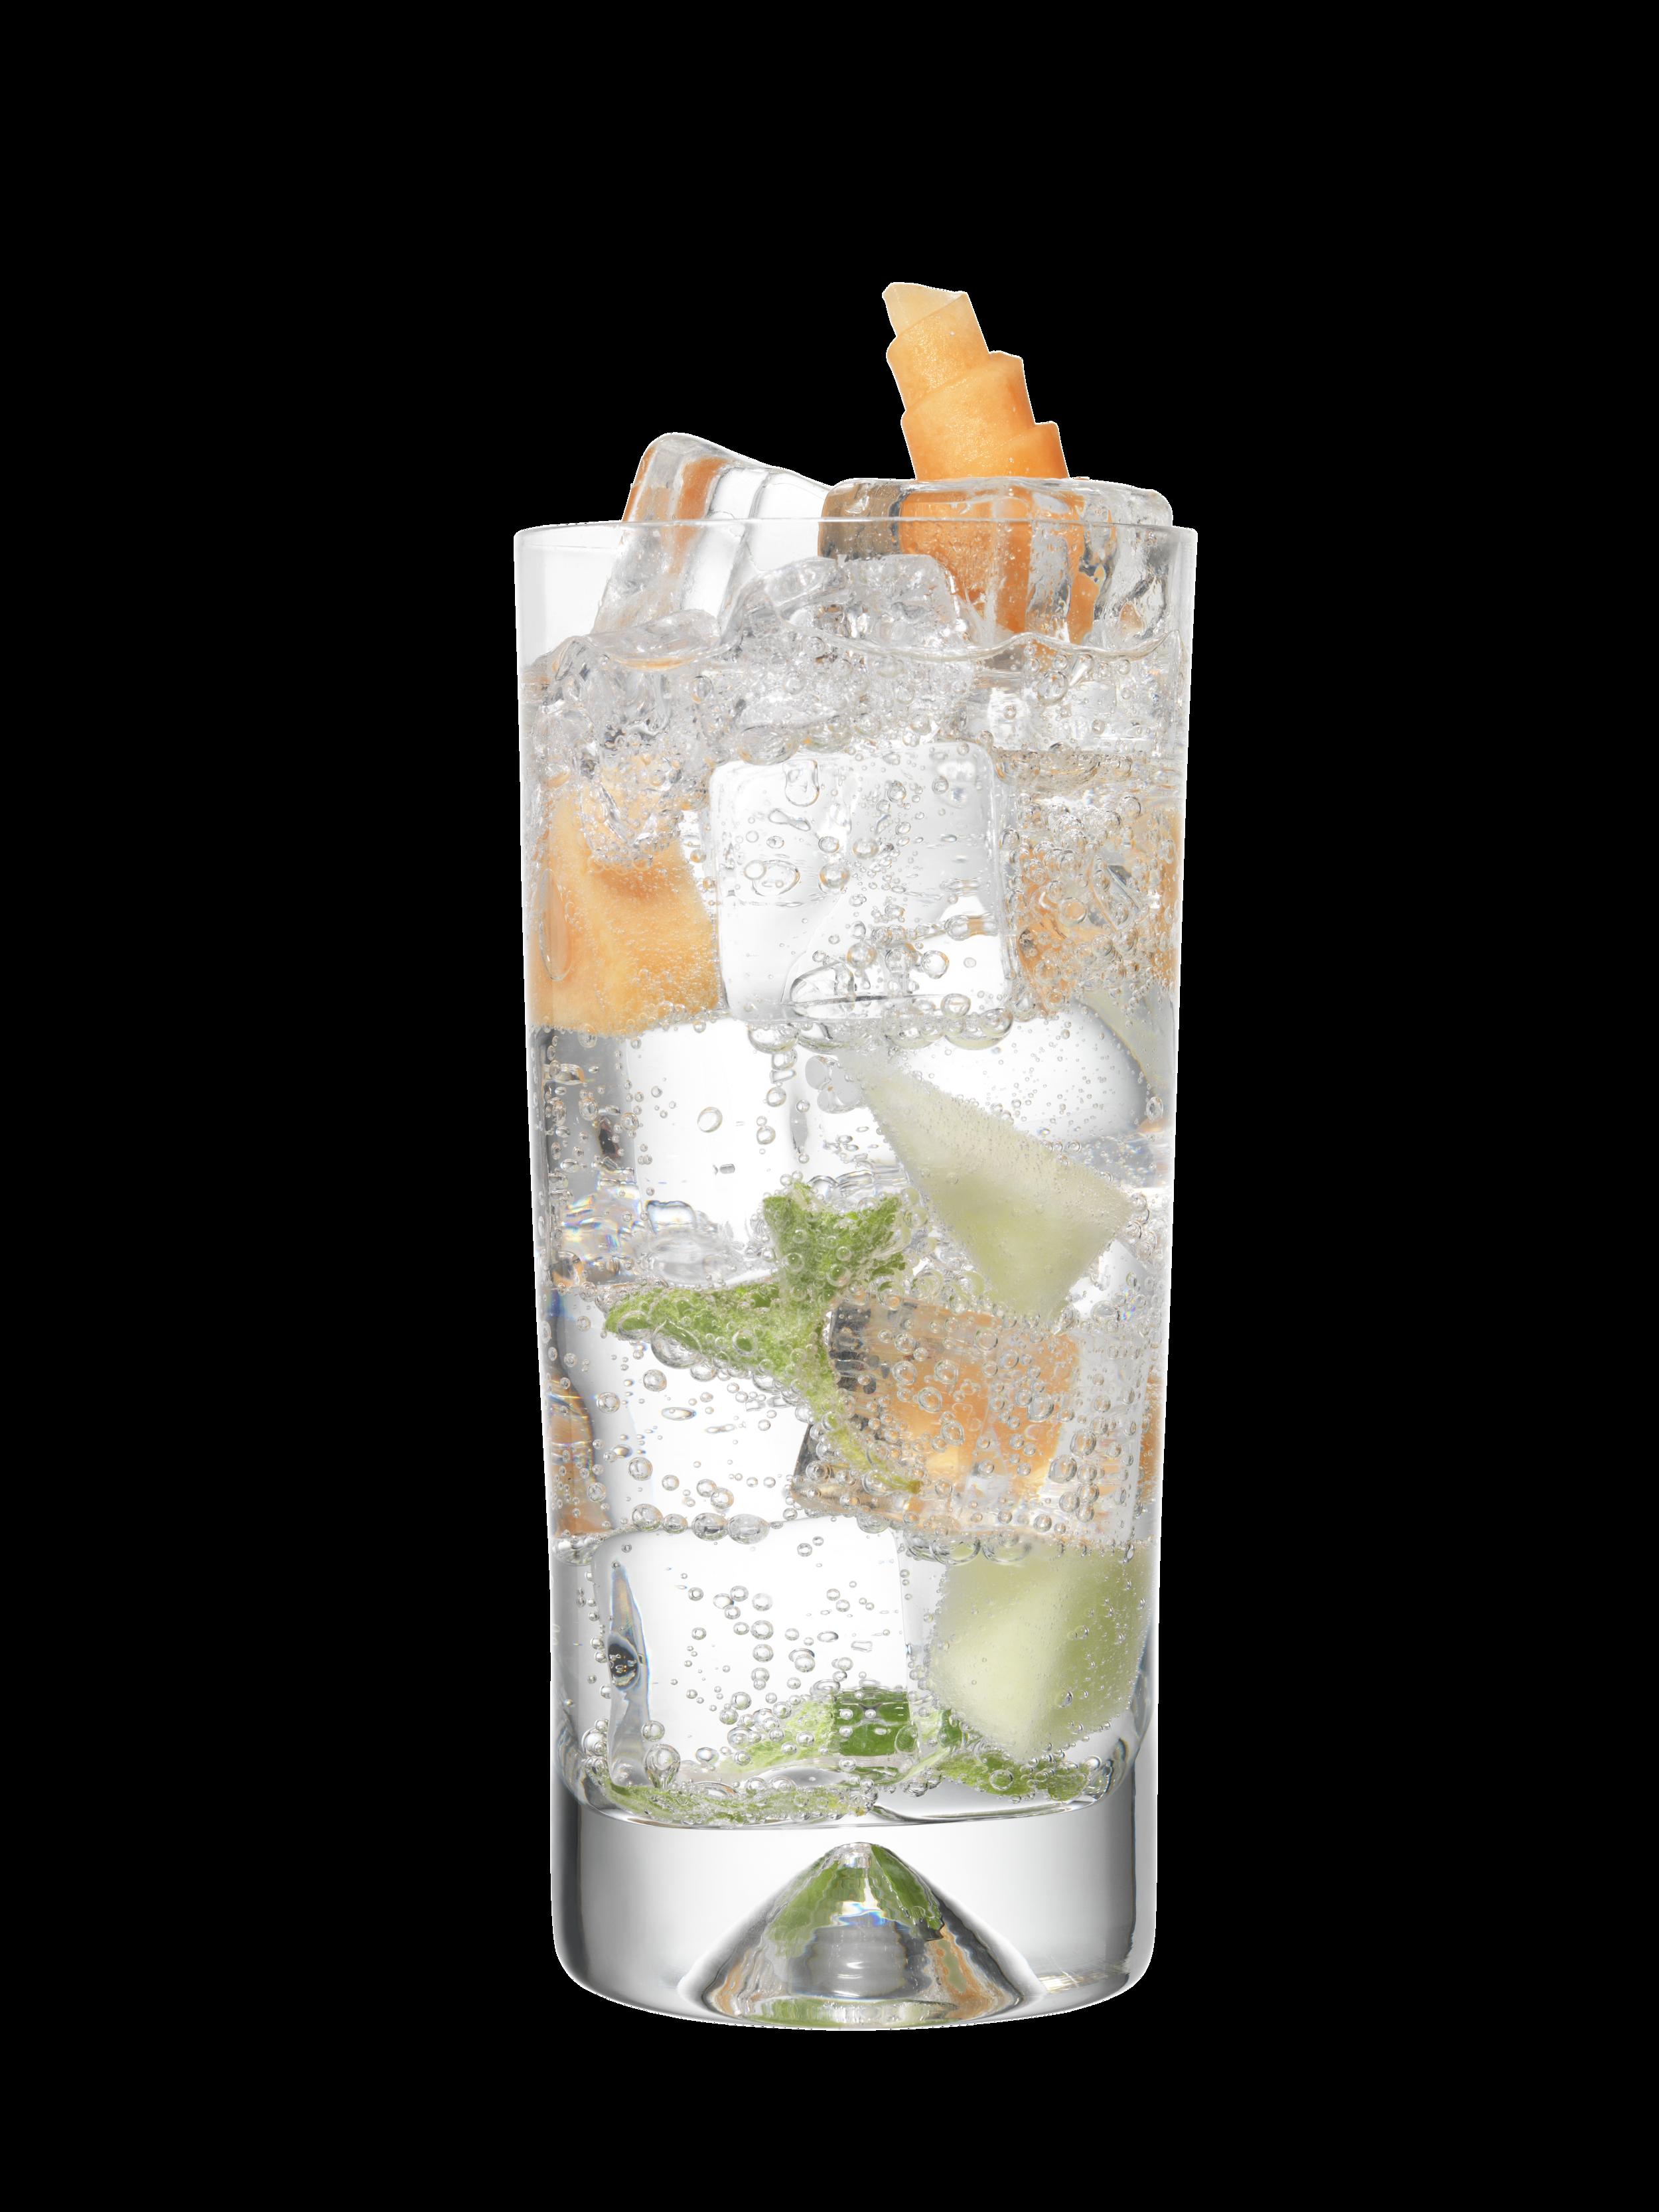 After The Rain - 50ml Fresh Rain Gin100ml Cucumber TonicPinch Fresh Oregano5 Melon Cubes